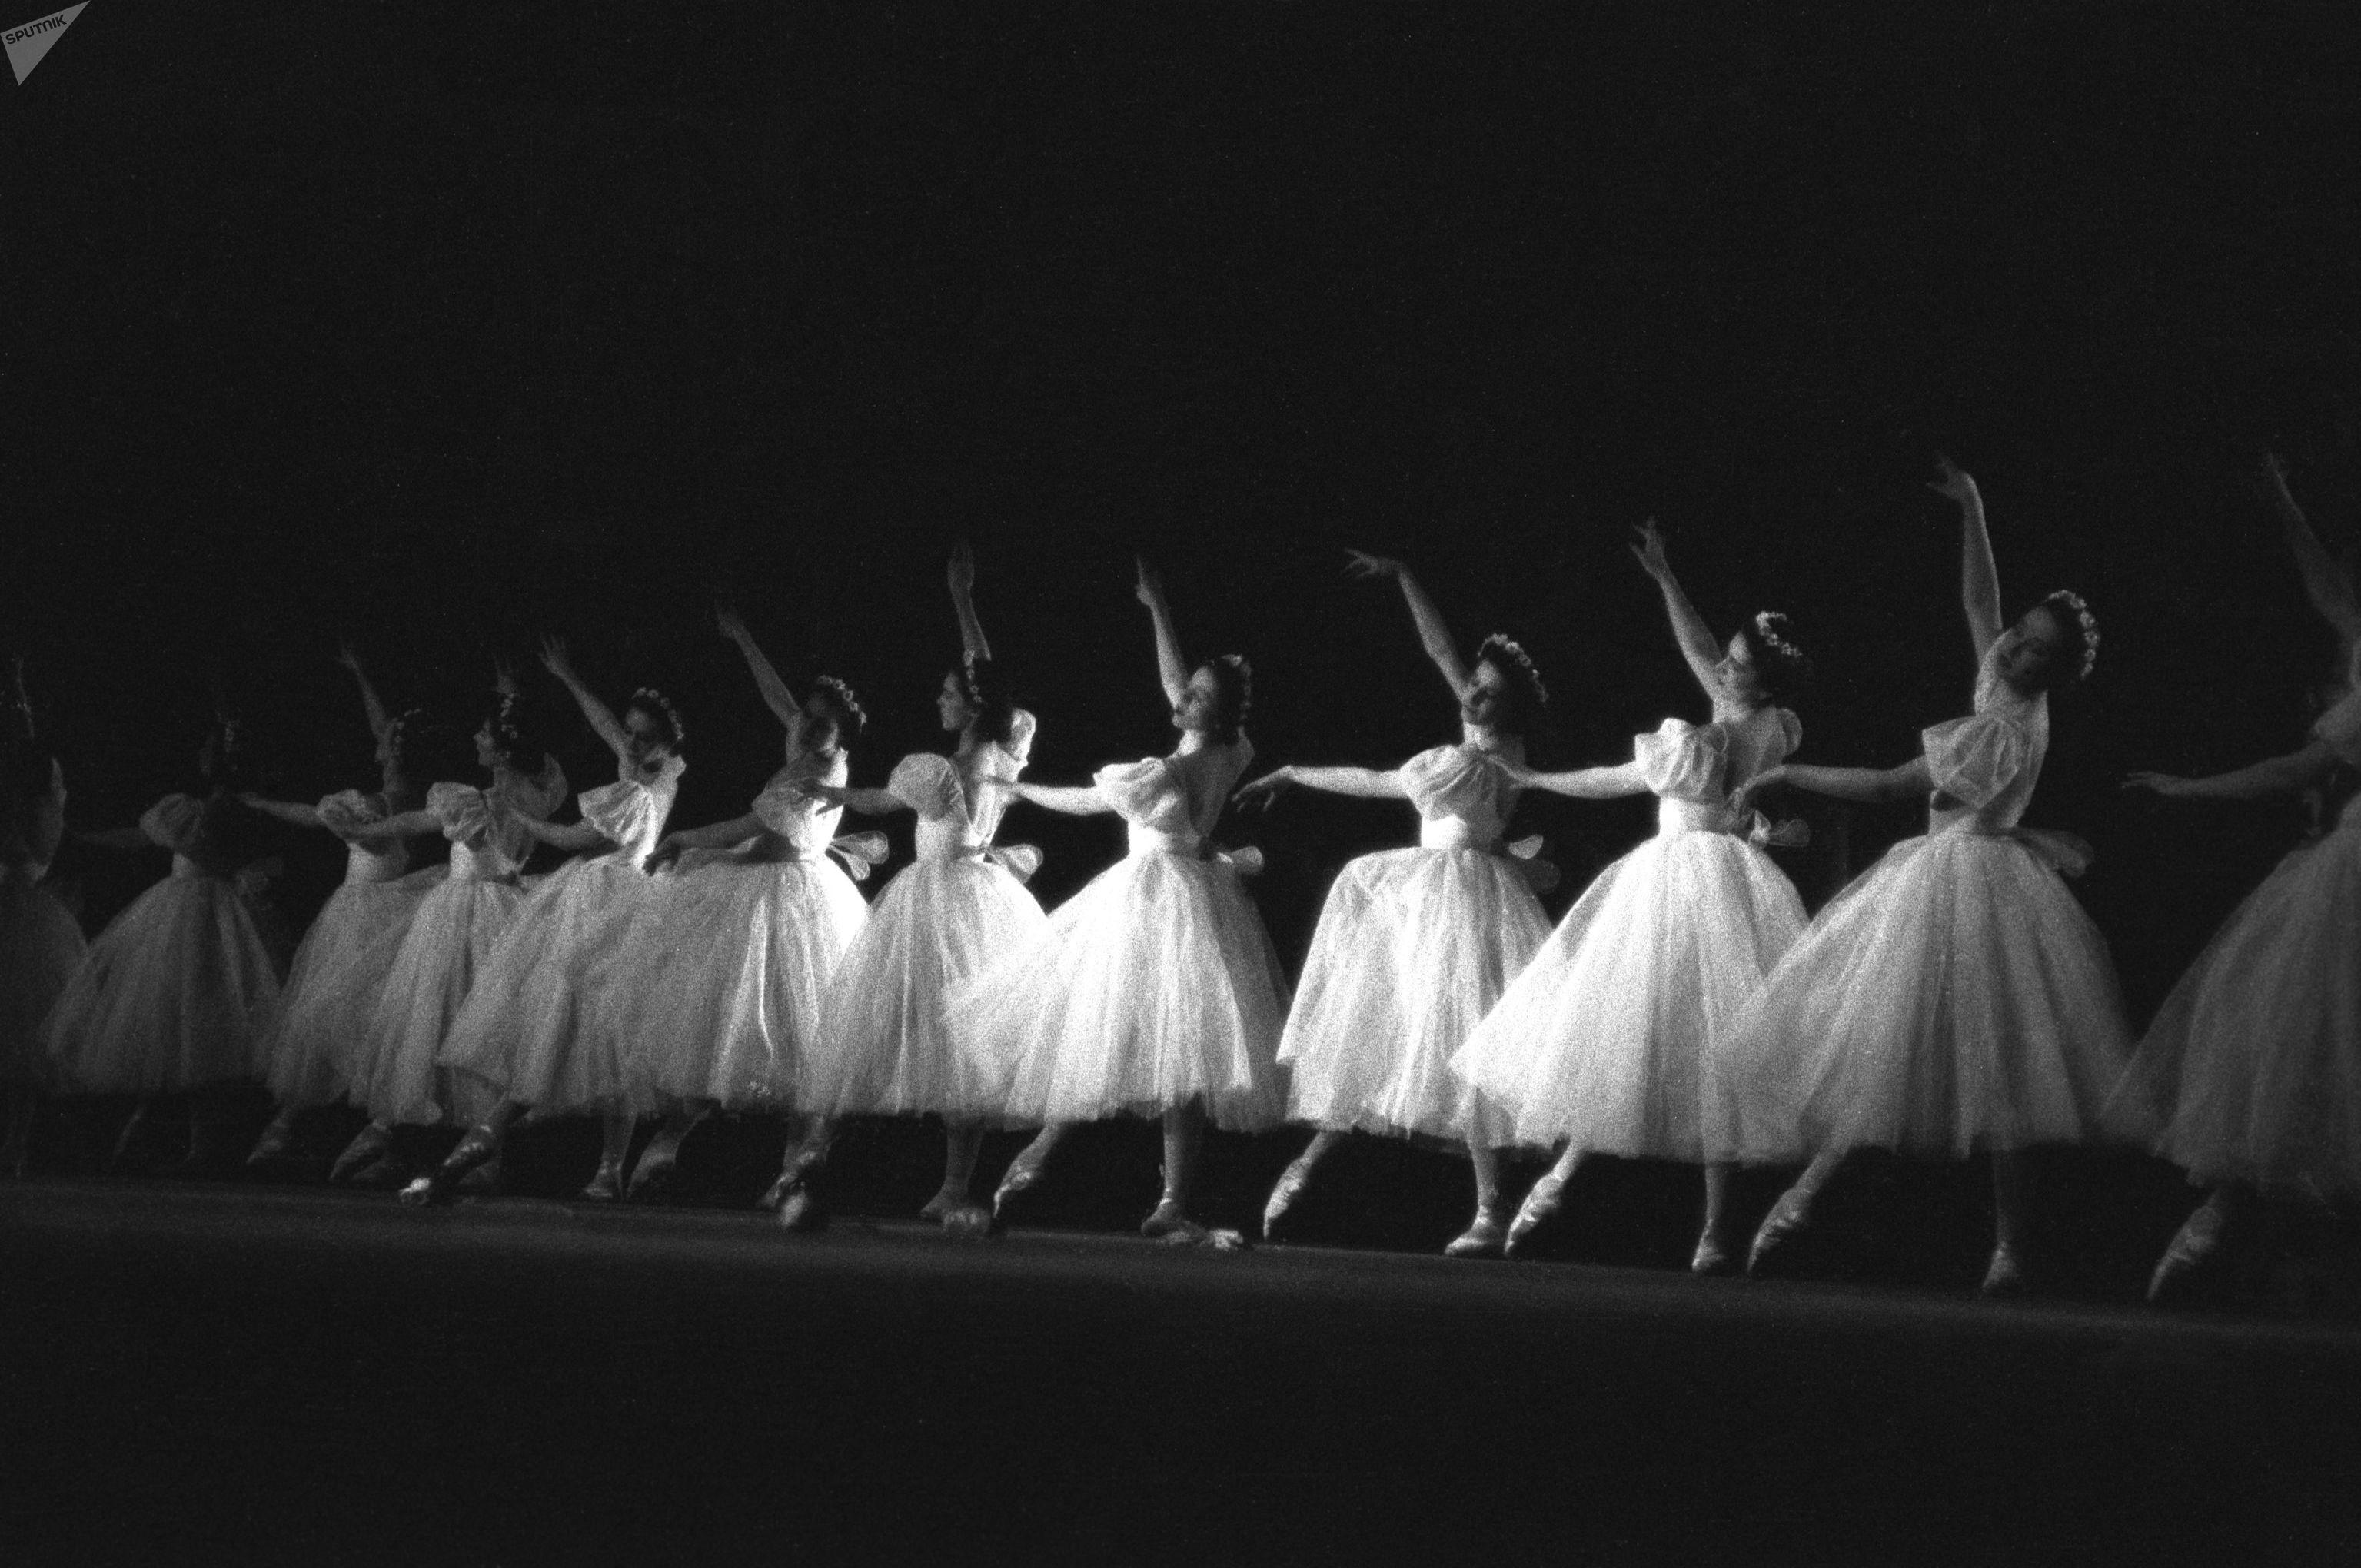 Ballet Giselle au Bolchoï, 1951